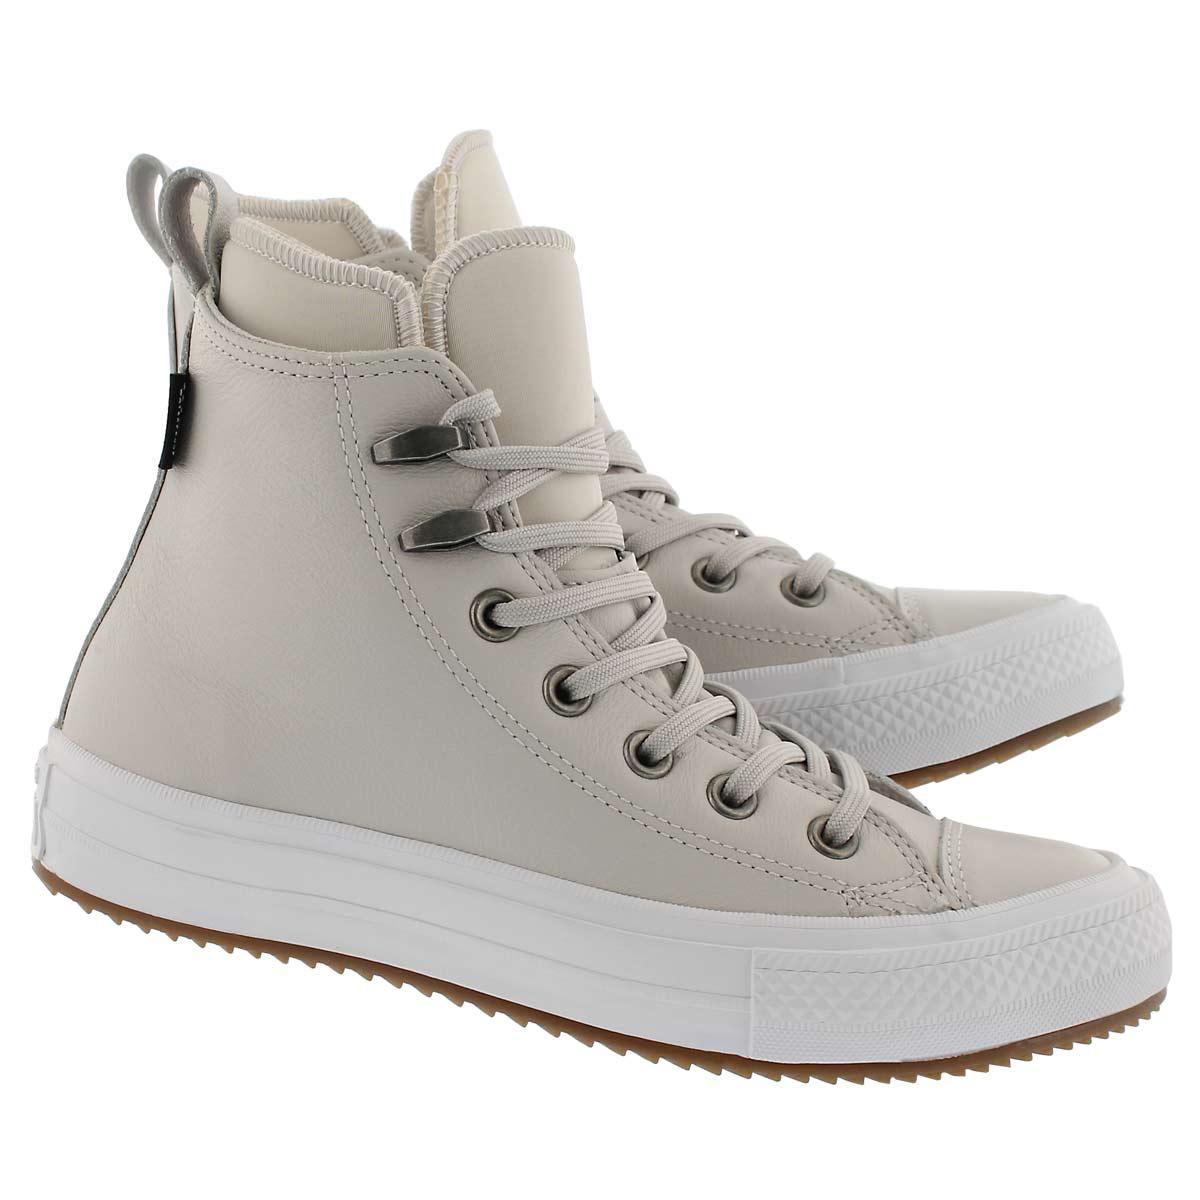 Lds CT A/S pale putty lthr wtpf boot